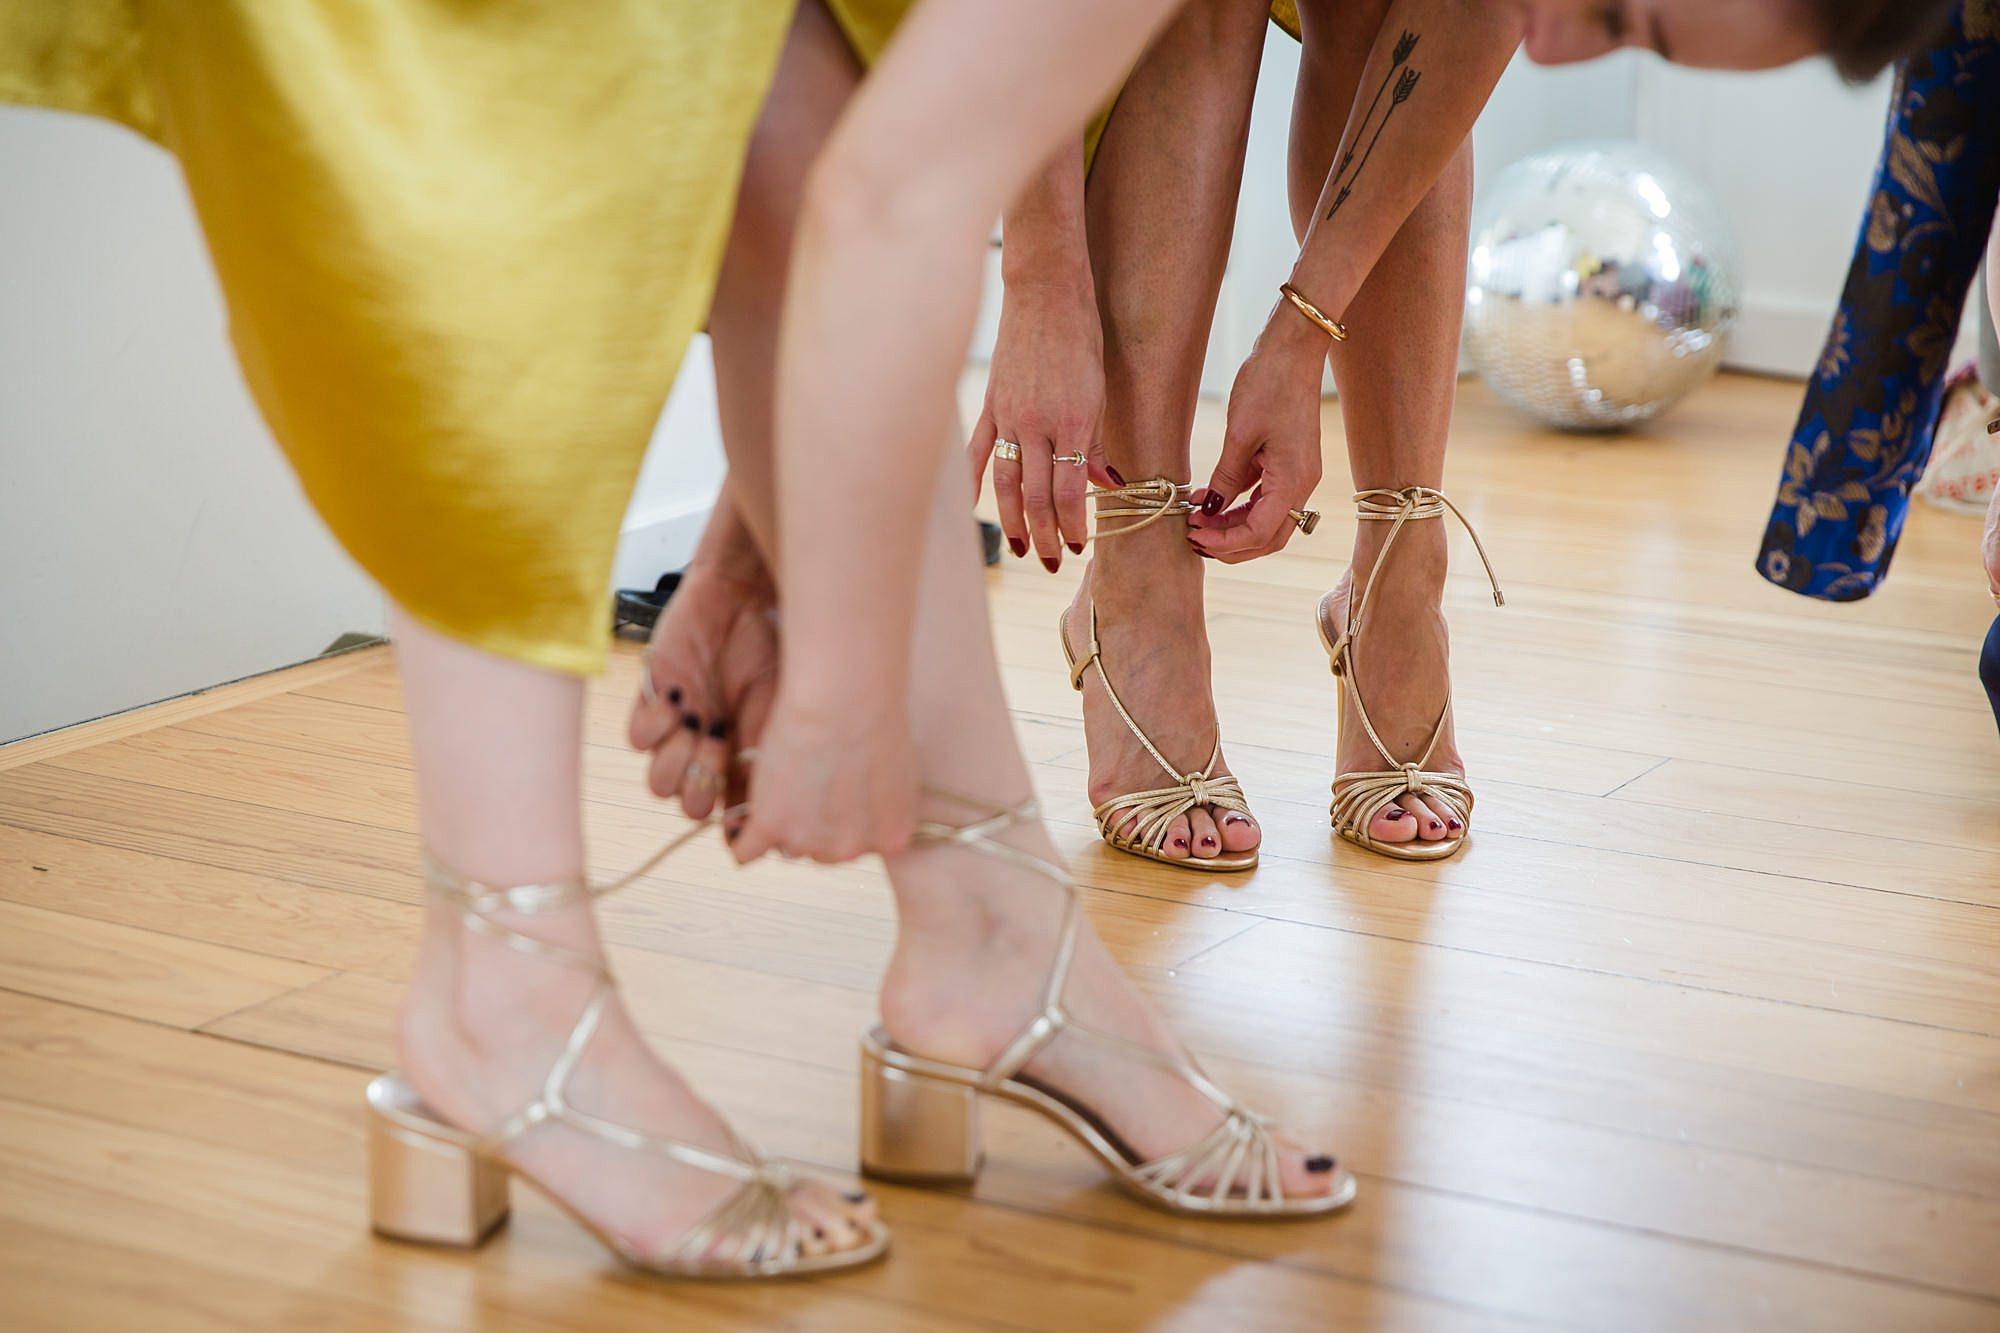 bridesmaids tying sold shoe straps